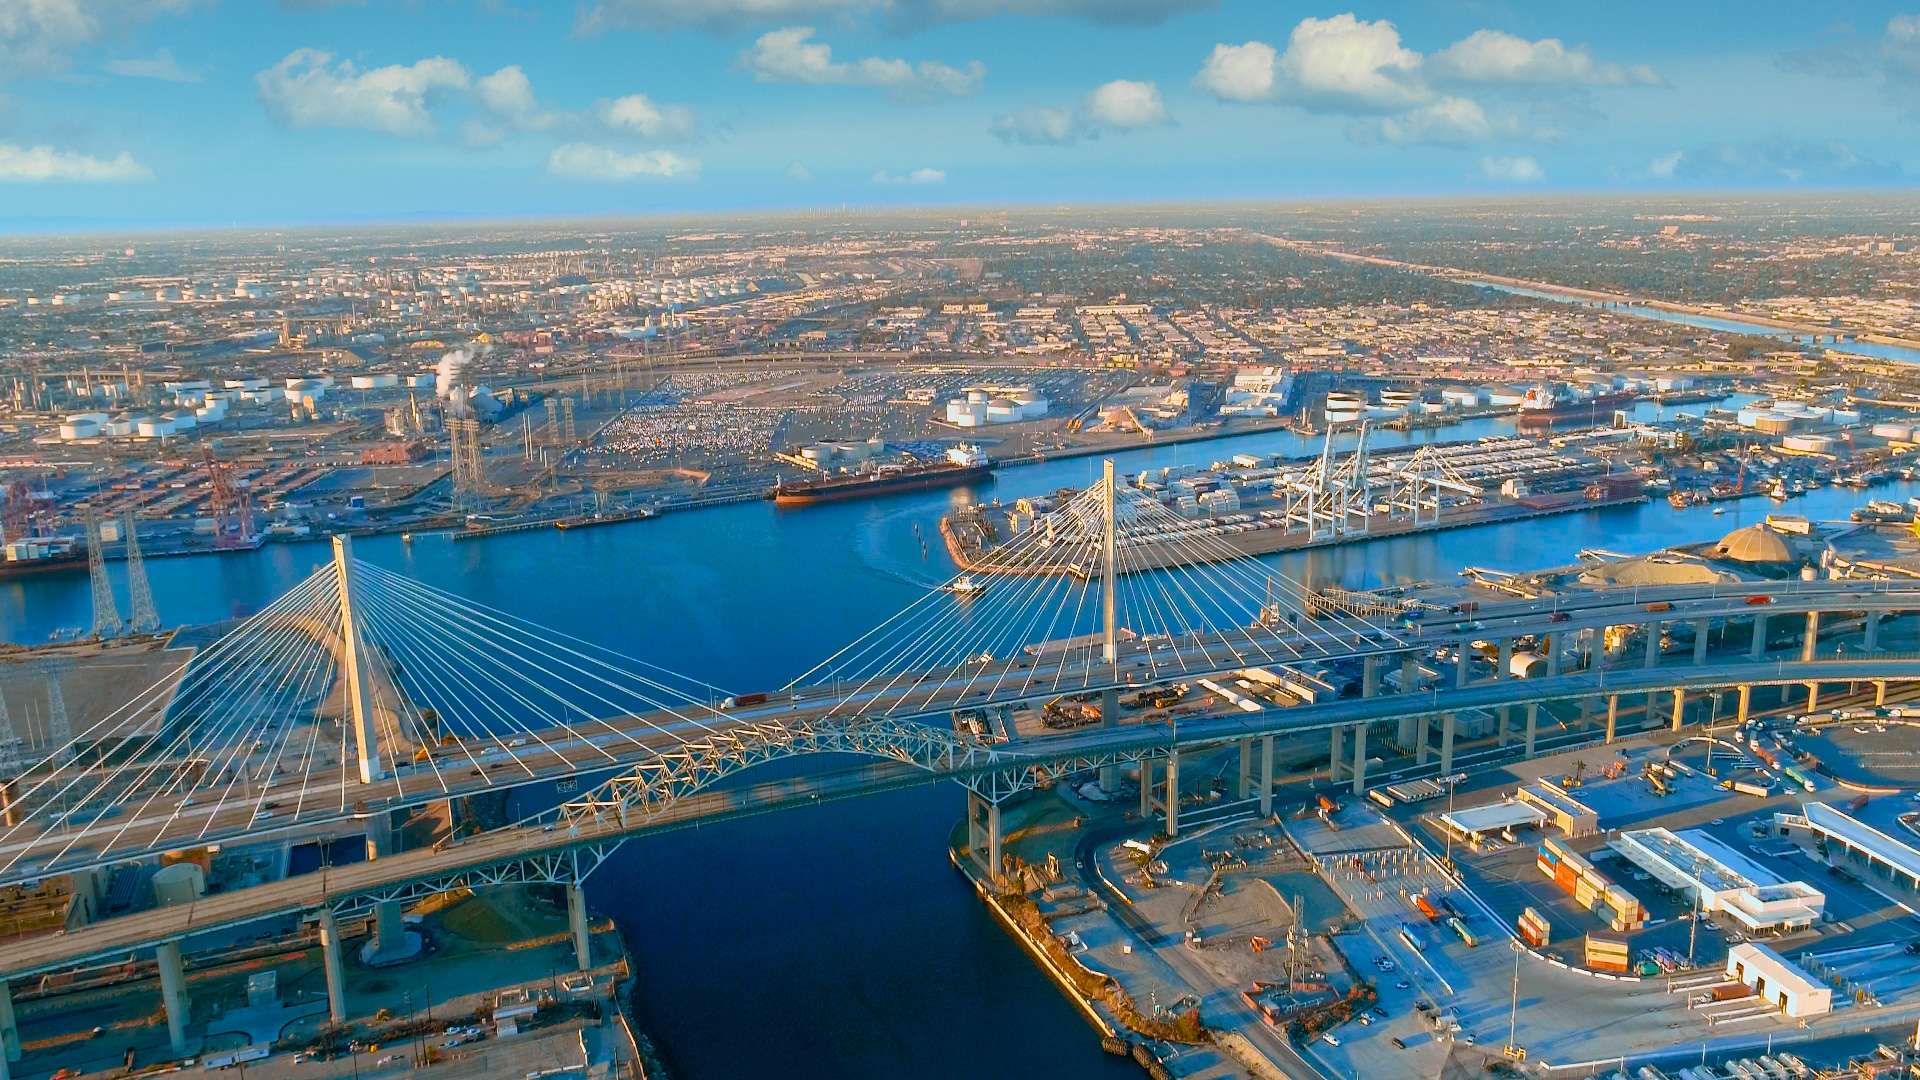 Downtown Development Corporation Evolves Into Long Beach Economic Partnership